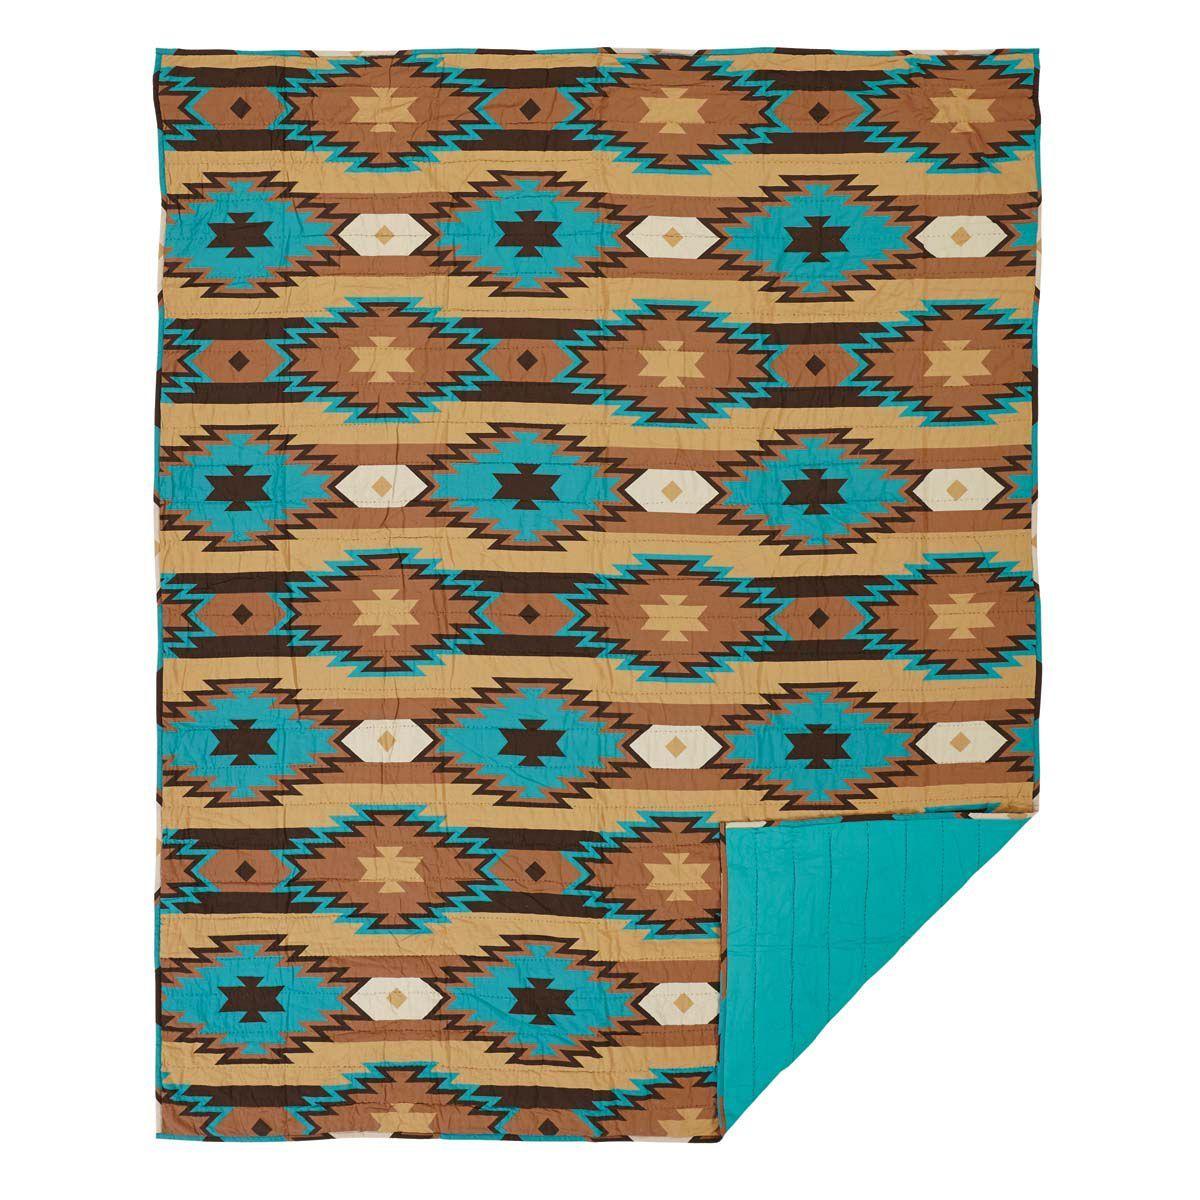 Santa Fe Turquoise Quilt in 4 Sizes